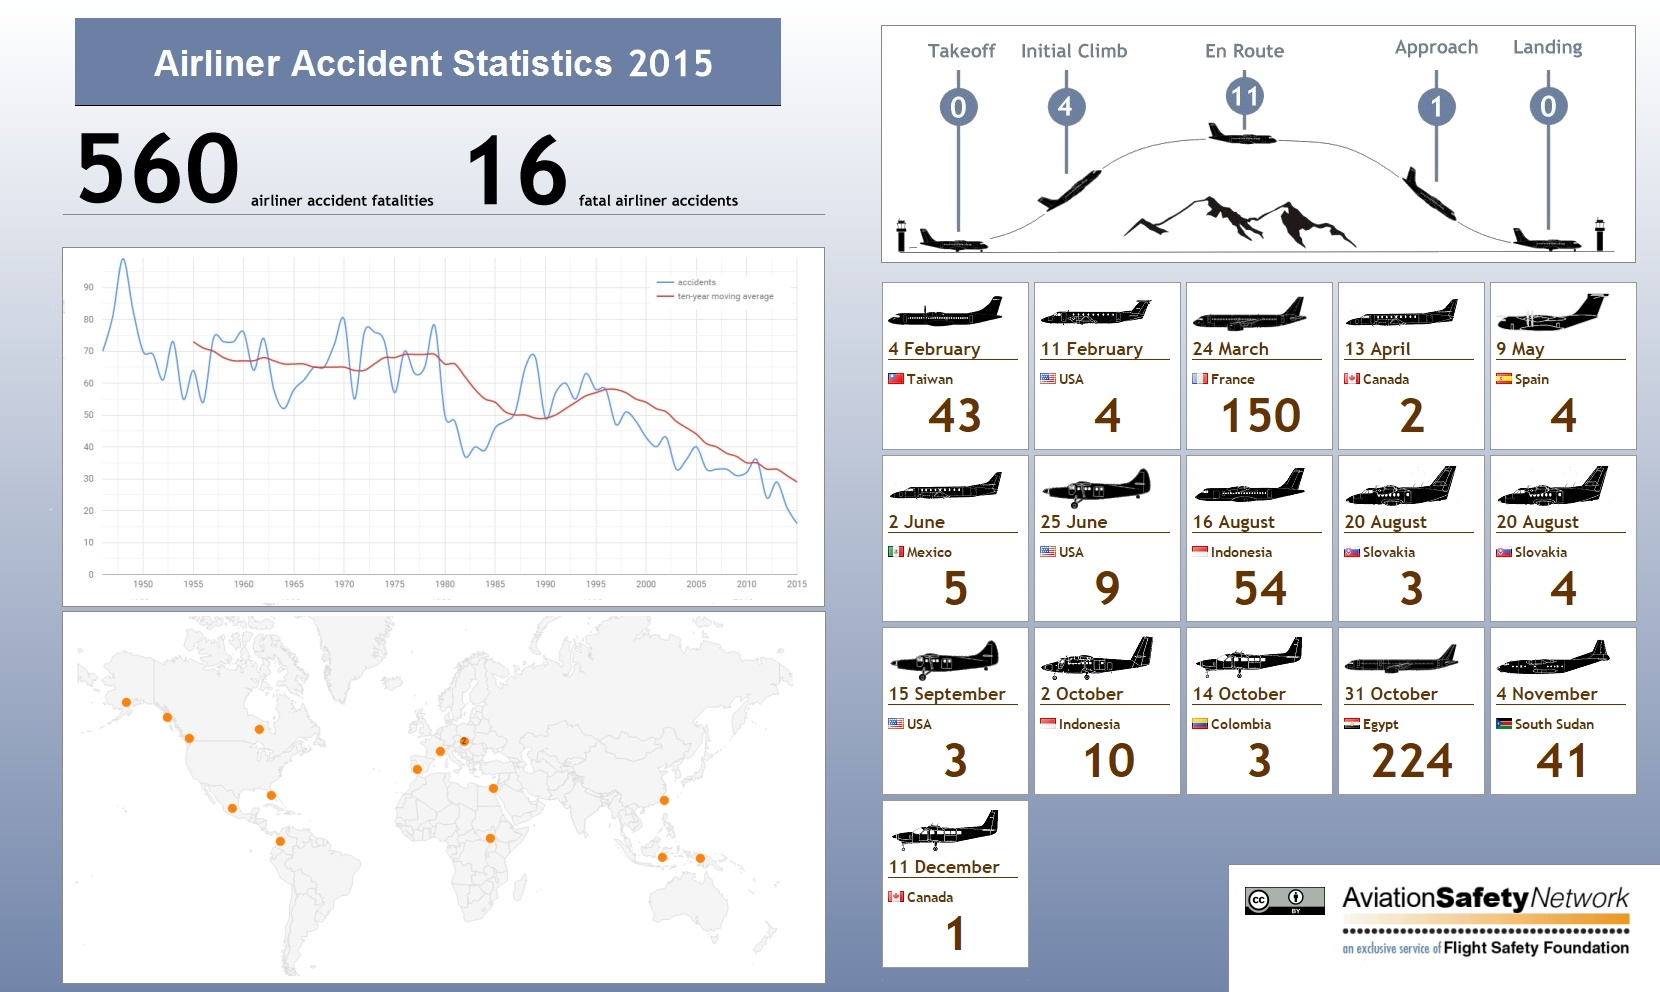 asn_infographic_2015.jpg